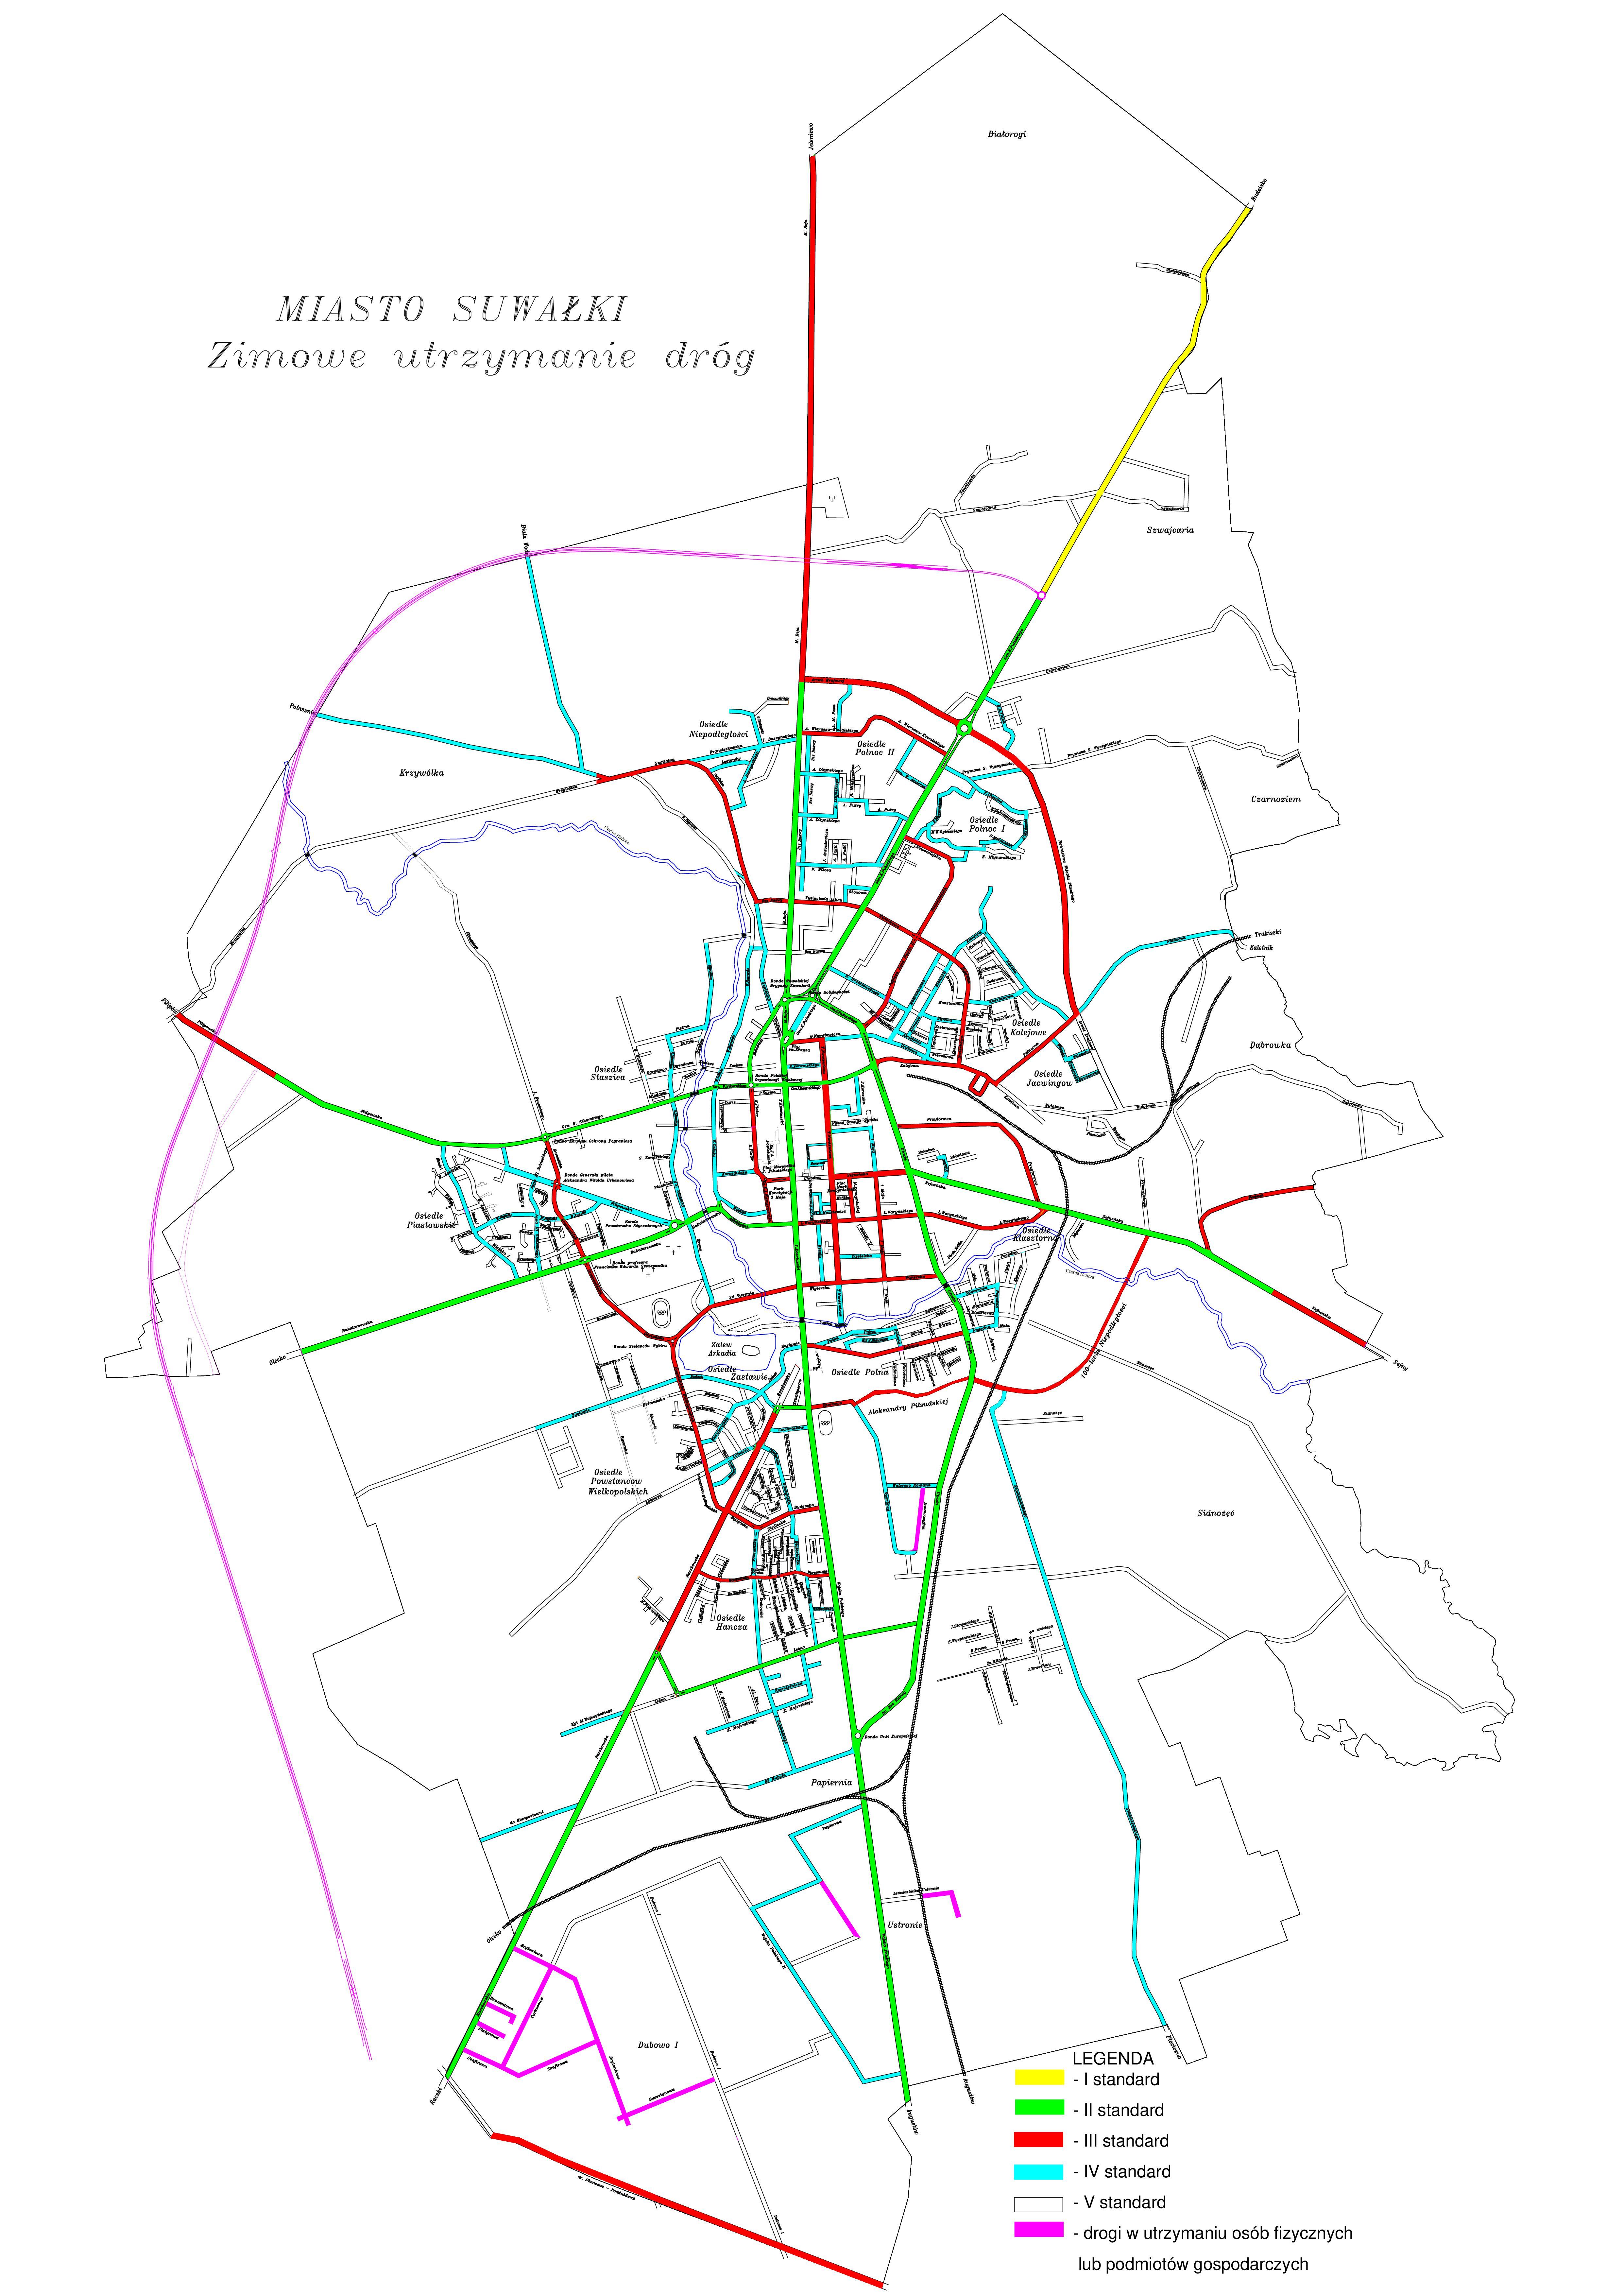 mapa zima 2019